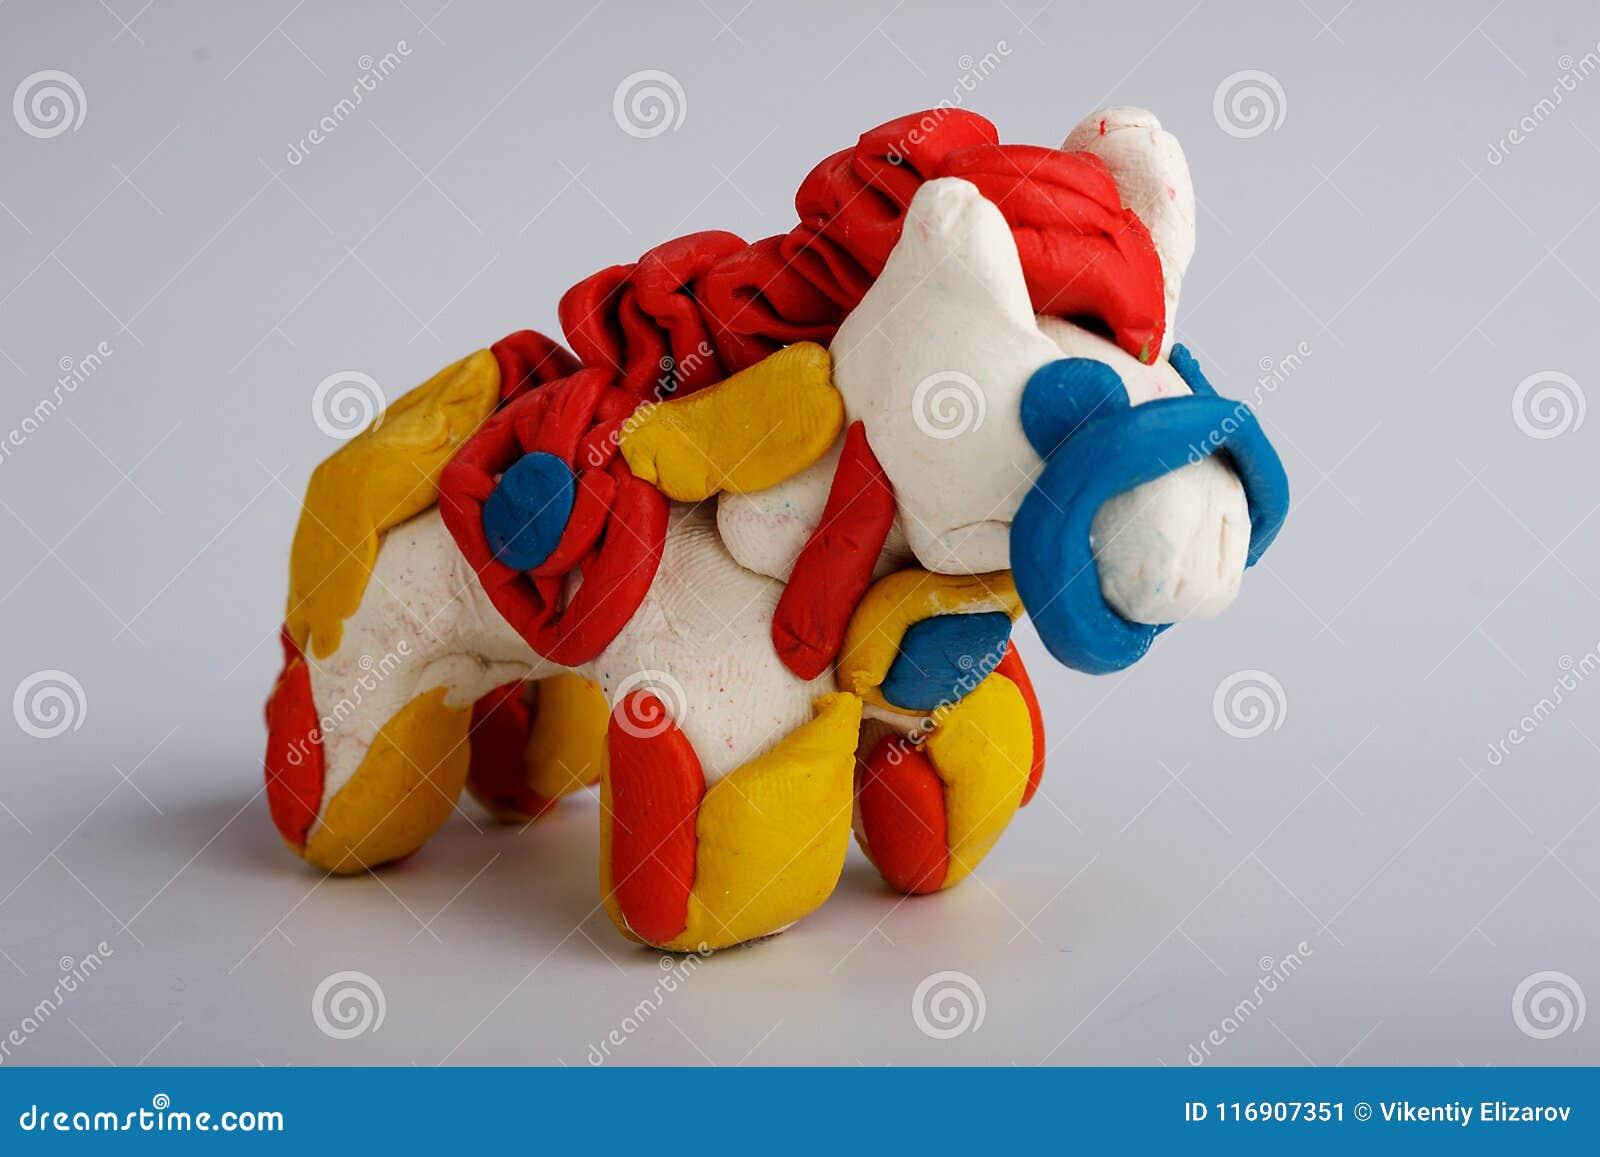 Koń robić plastelina na jednorodnym tle